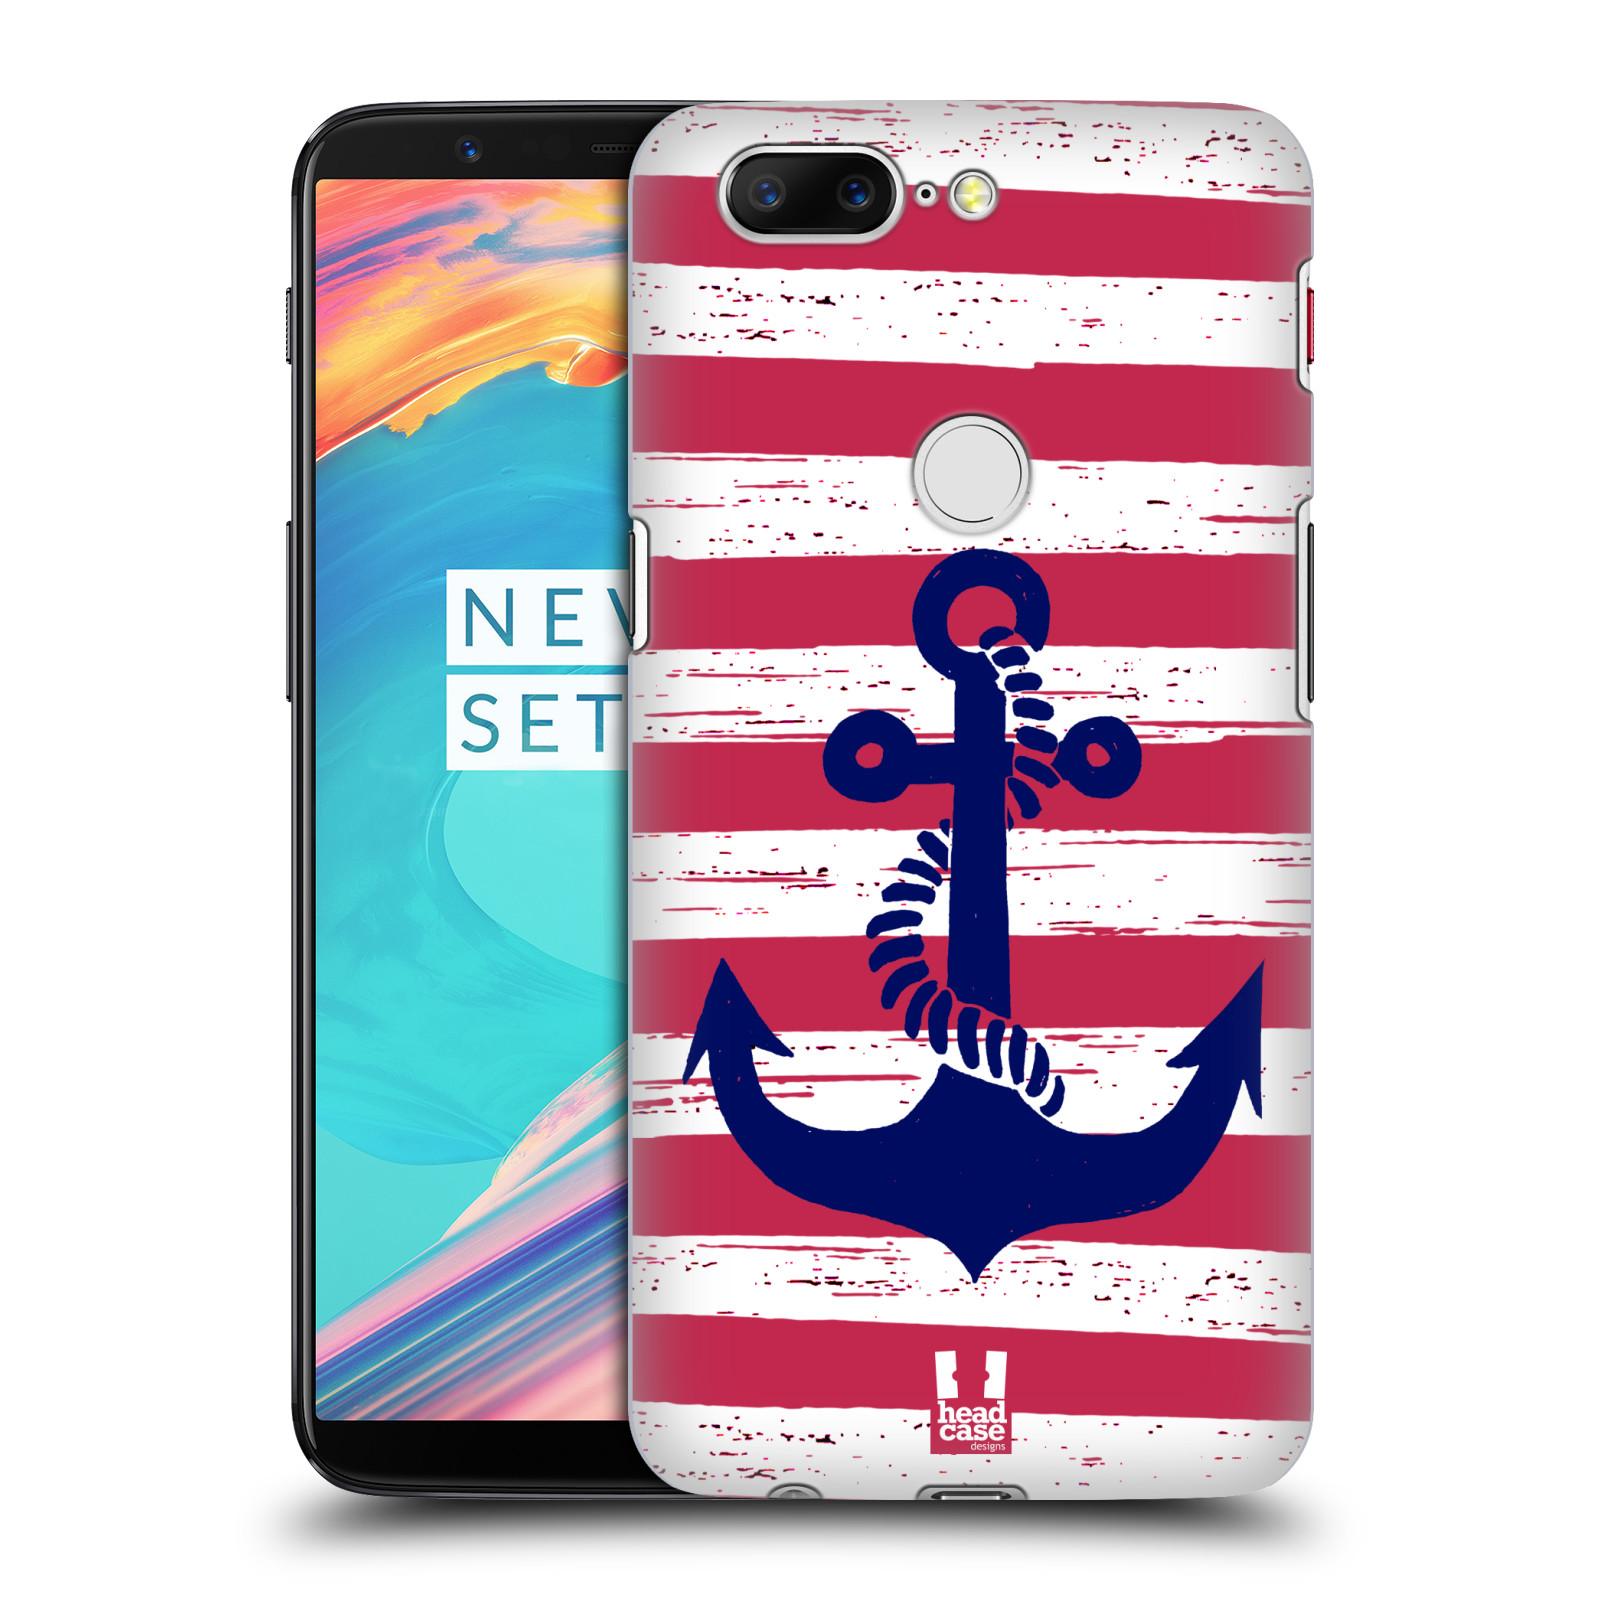 Plastové pouzdro na mobil OnePlus 5T - Head Case - KOTVA S PRUHY